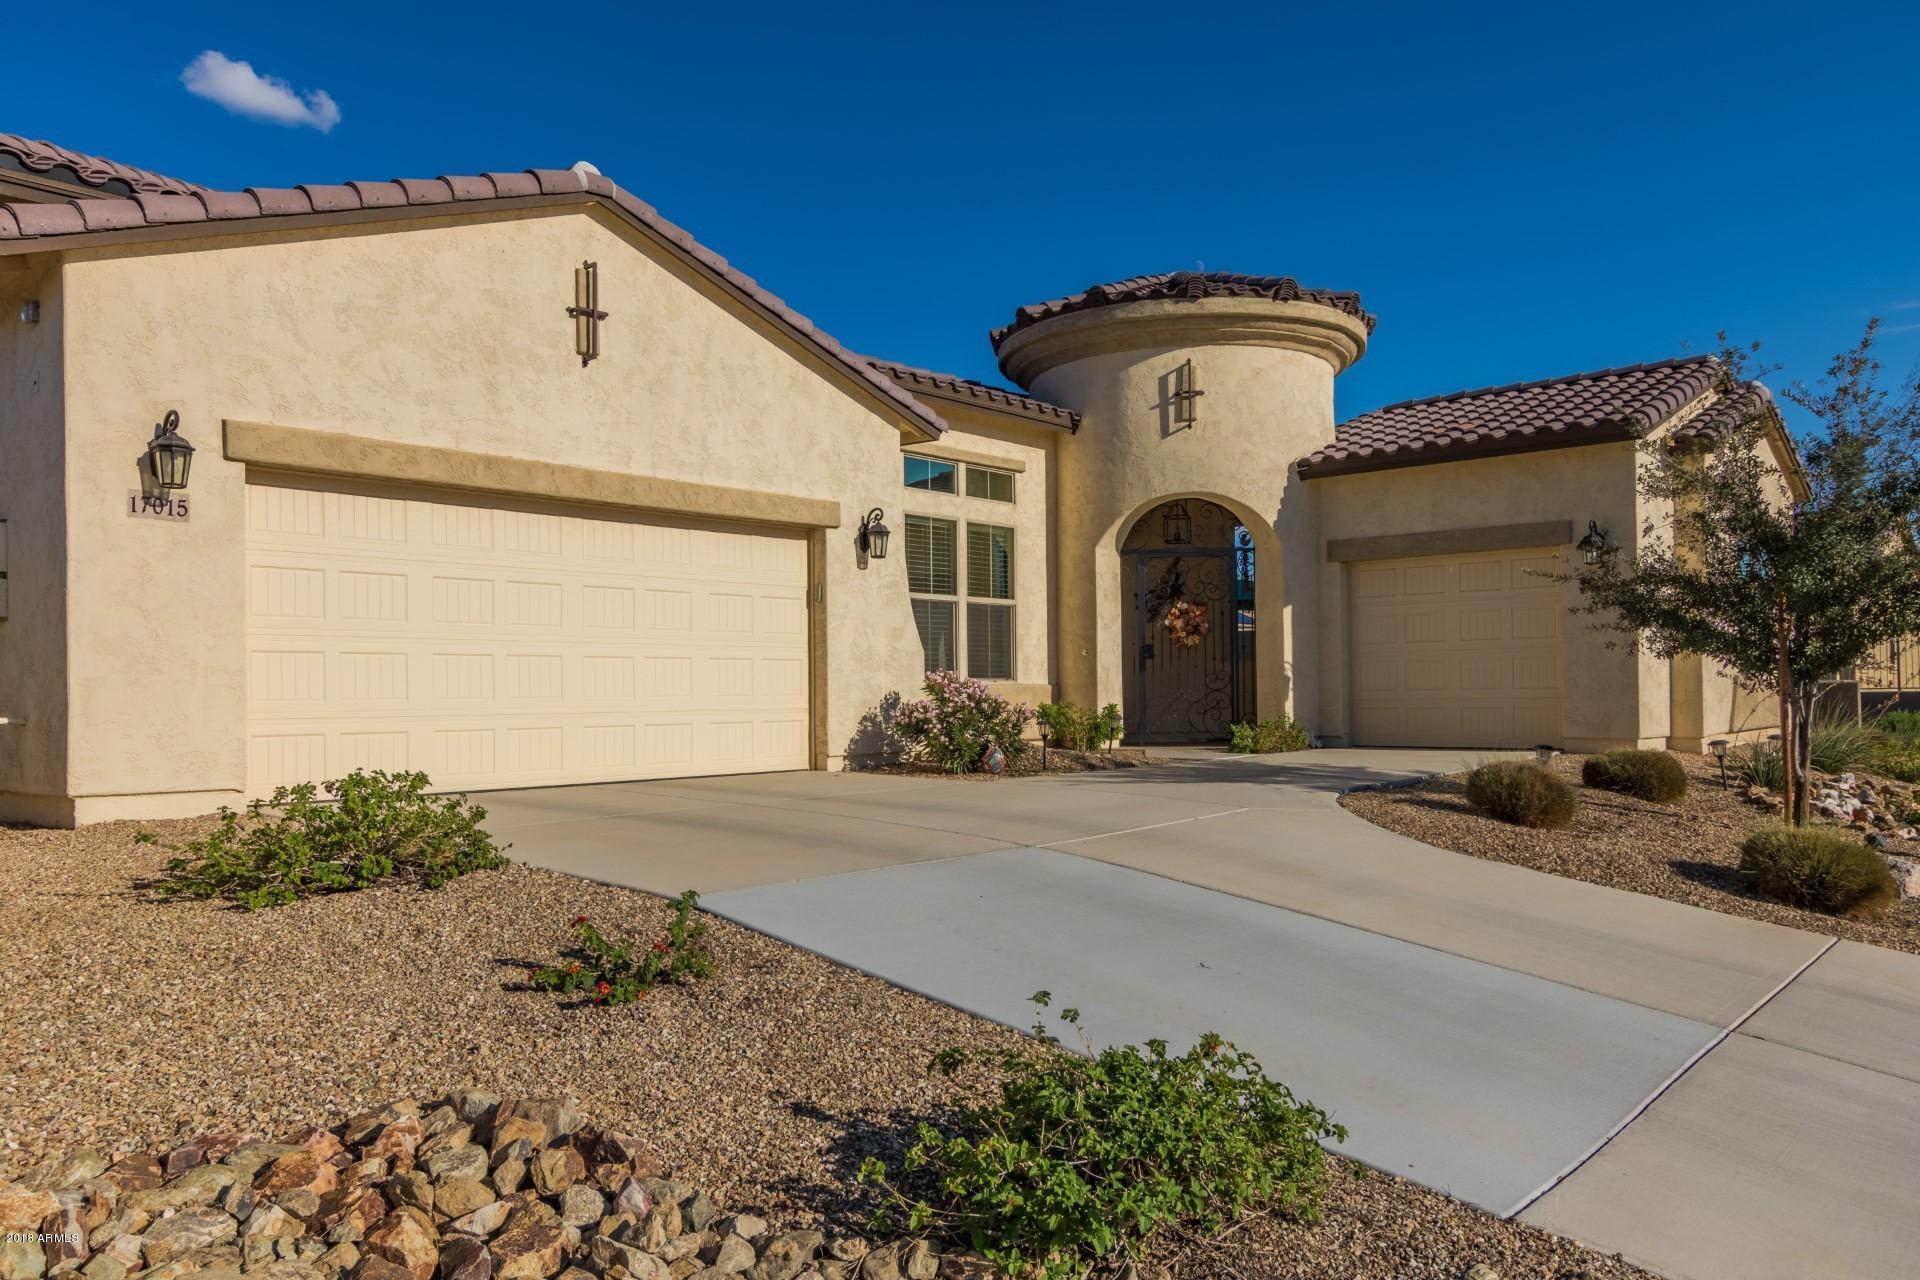 17015 S 175TH Avenue, Goodyear, AZ 85338